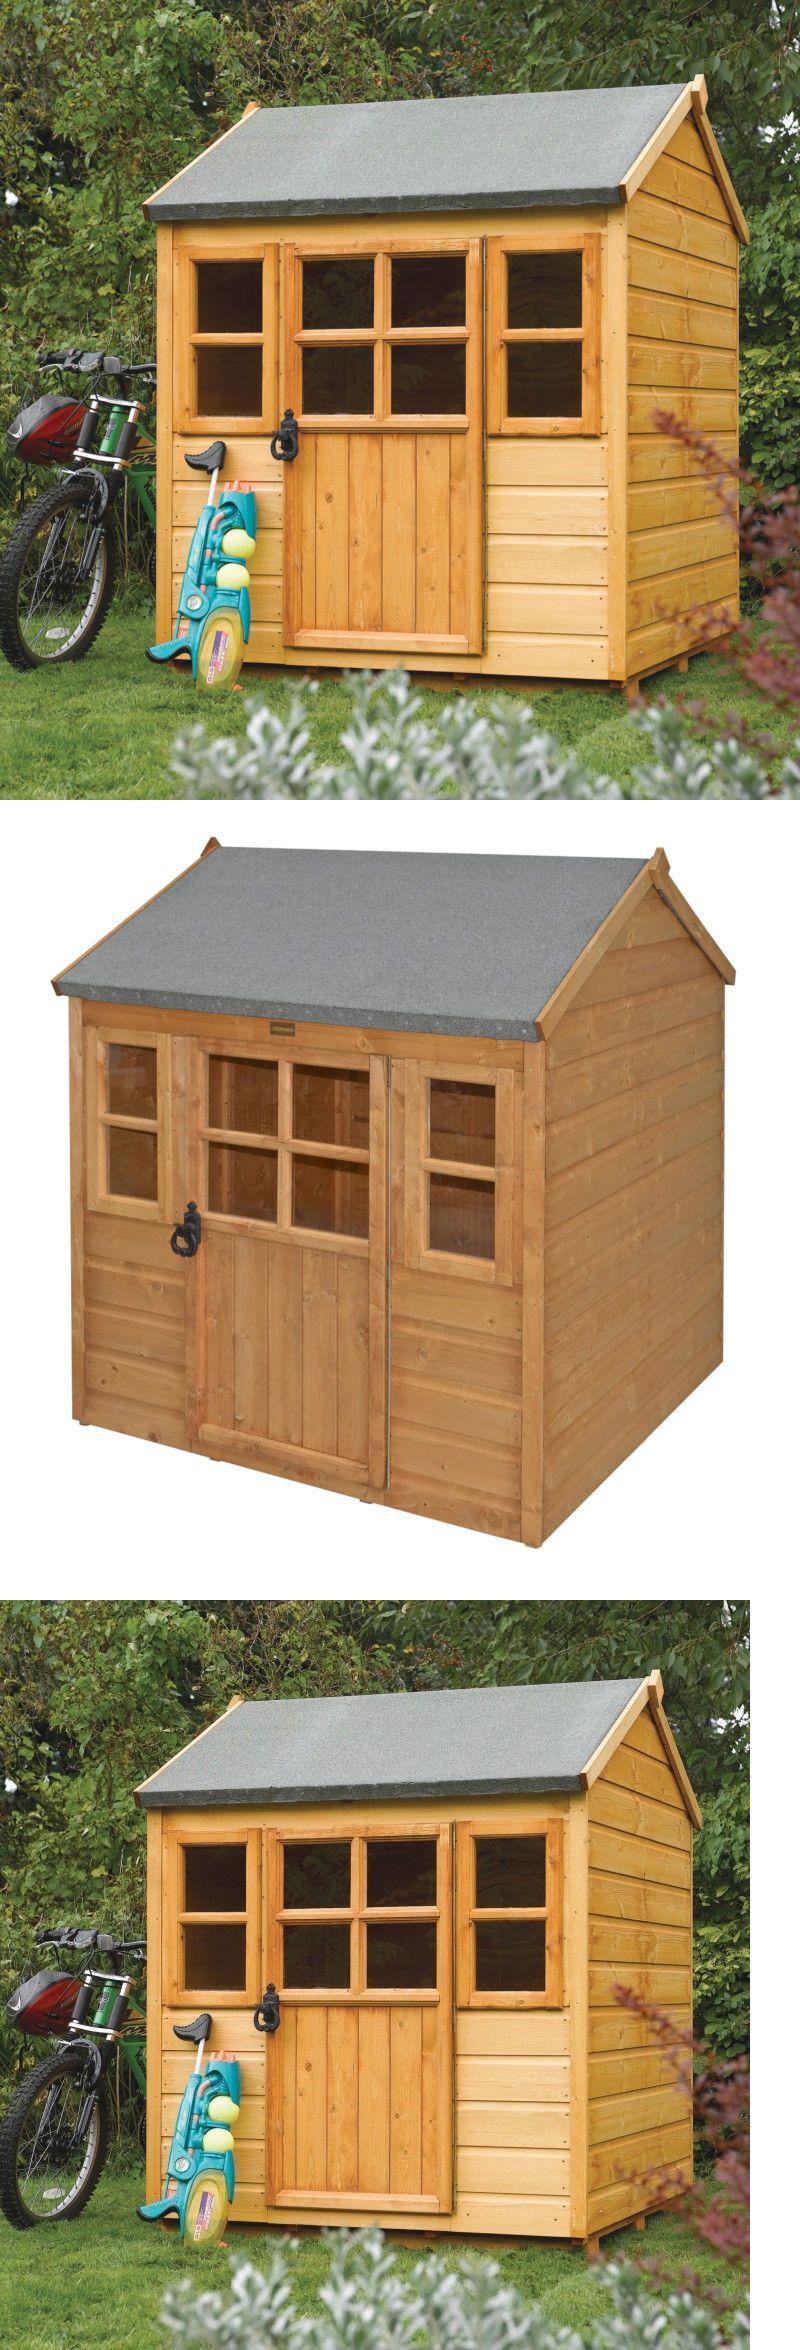 permanent playhouses 145995 children outdoor wood playhouse kids